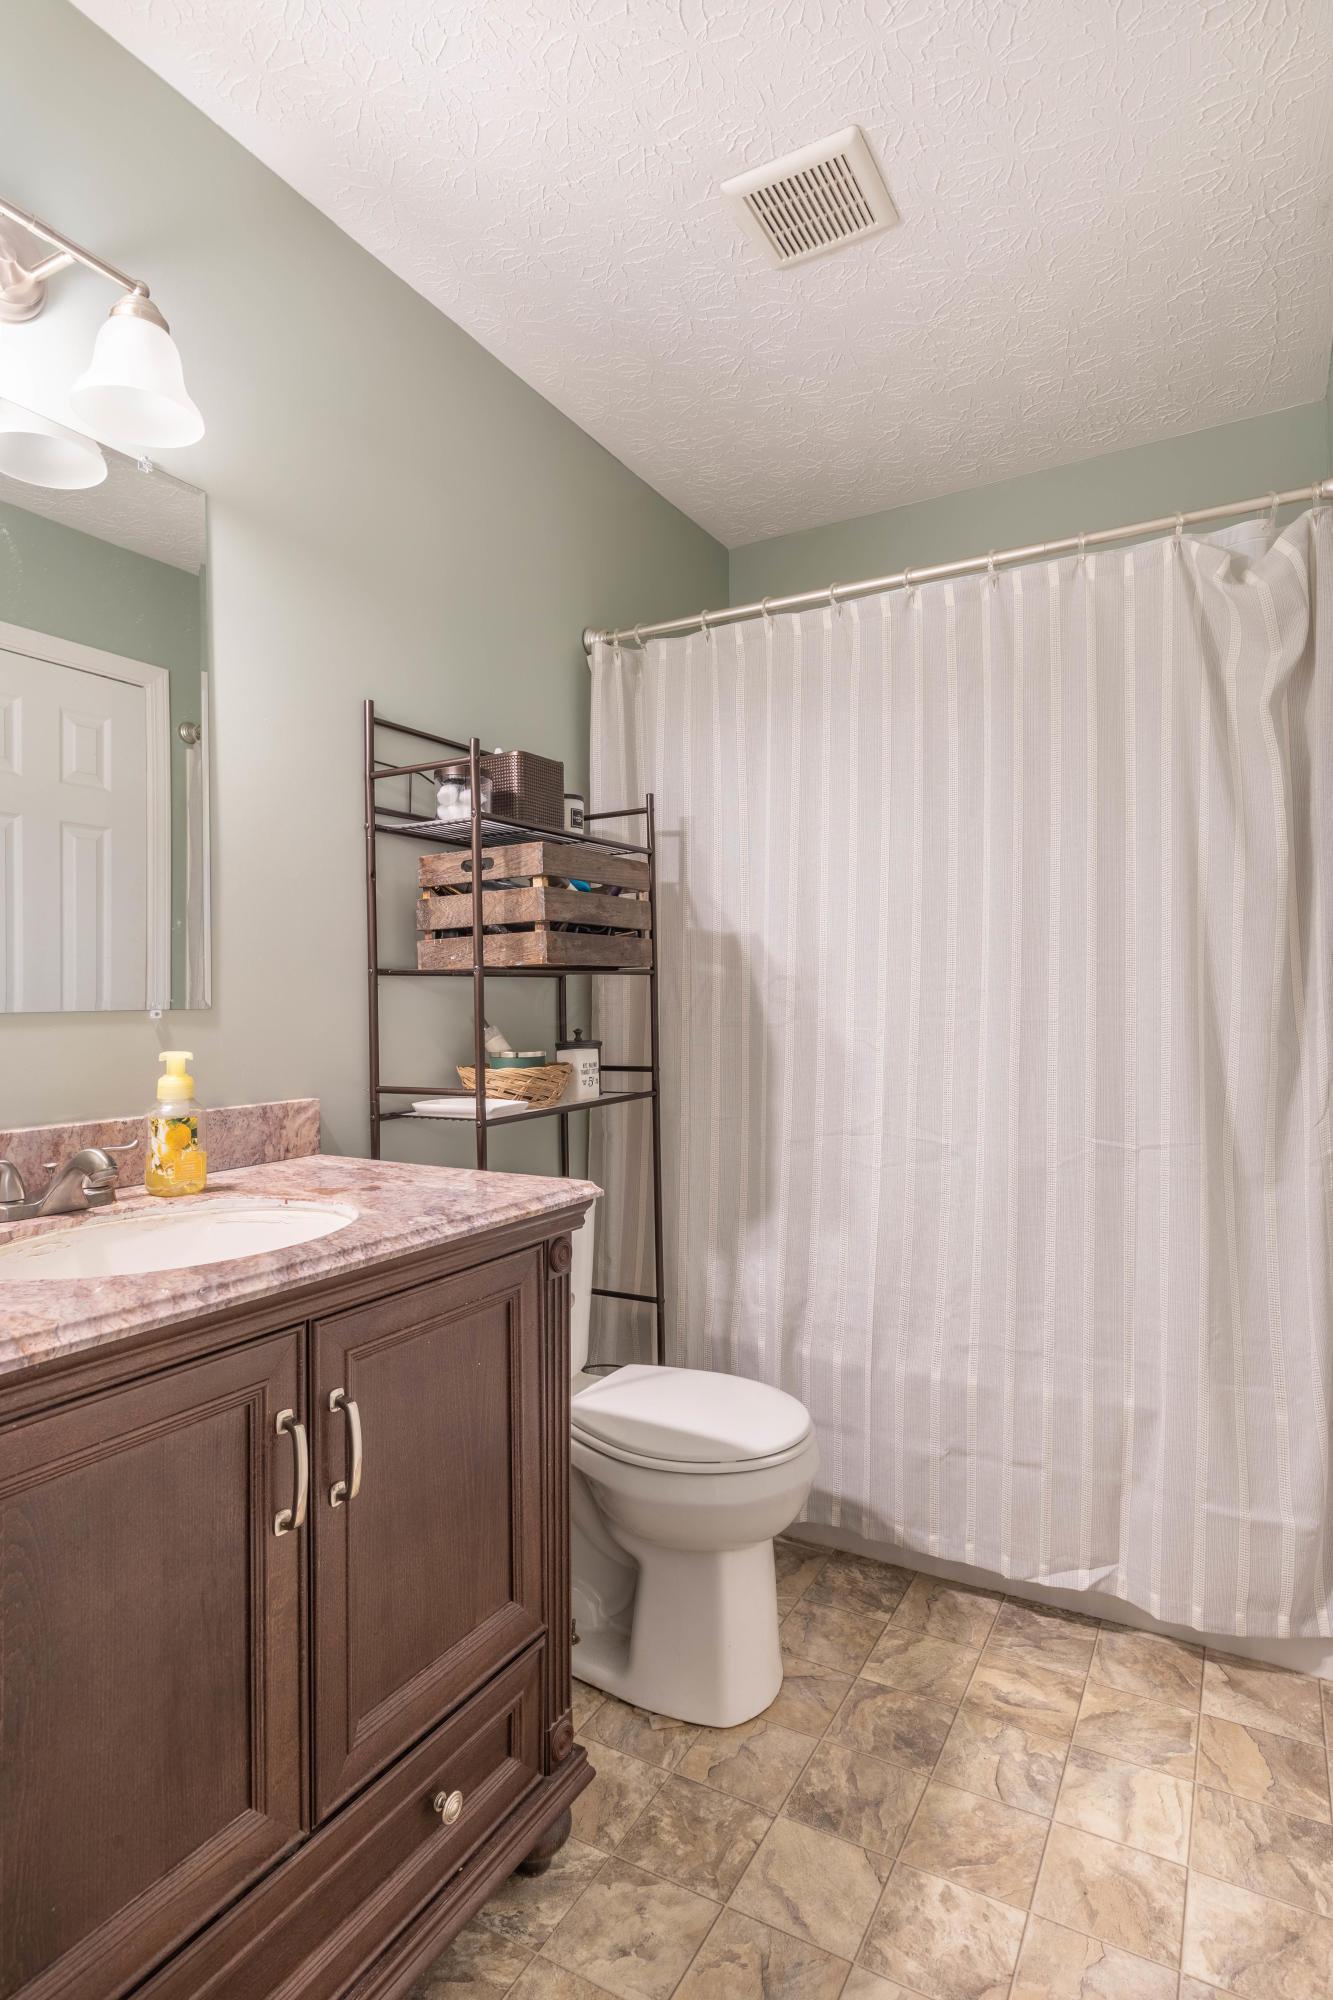 3141 Eppleworth Drive, Dublin, Ohio 43017, 3 Bedrooms Bedrooms, ,1 BathroomBathrooms,Residential,For Sale,Eppleworth,220039954